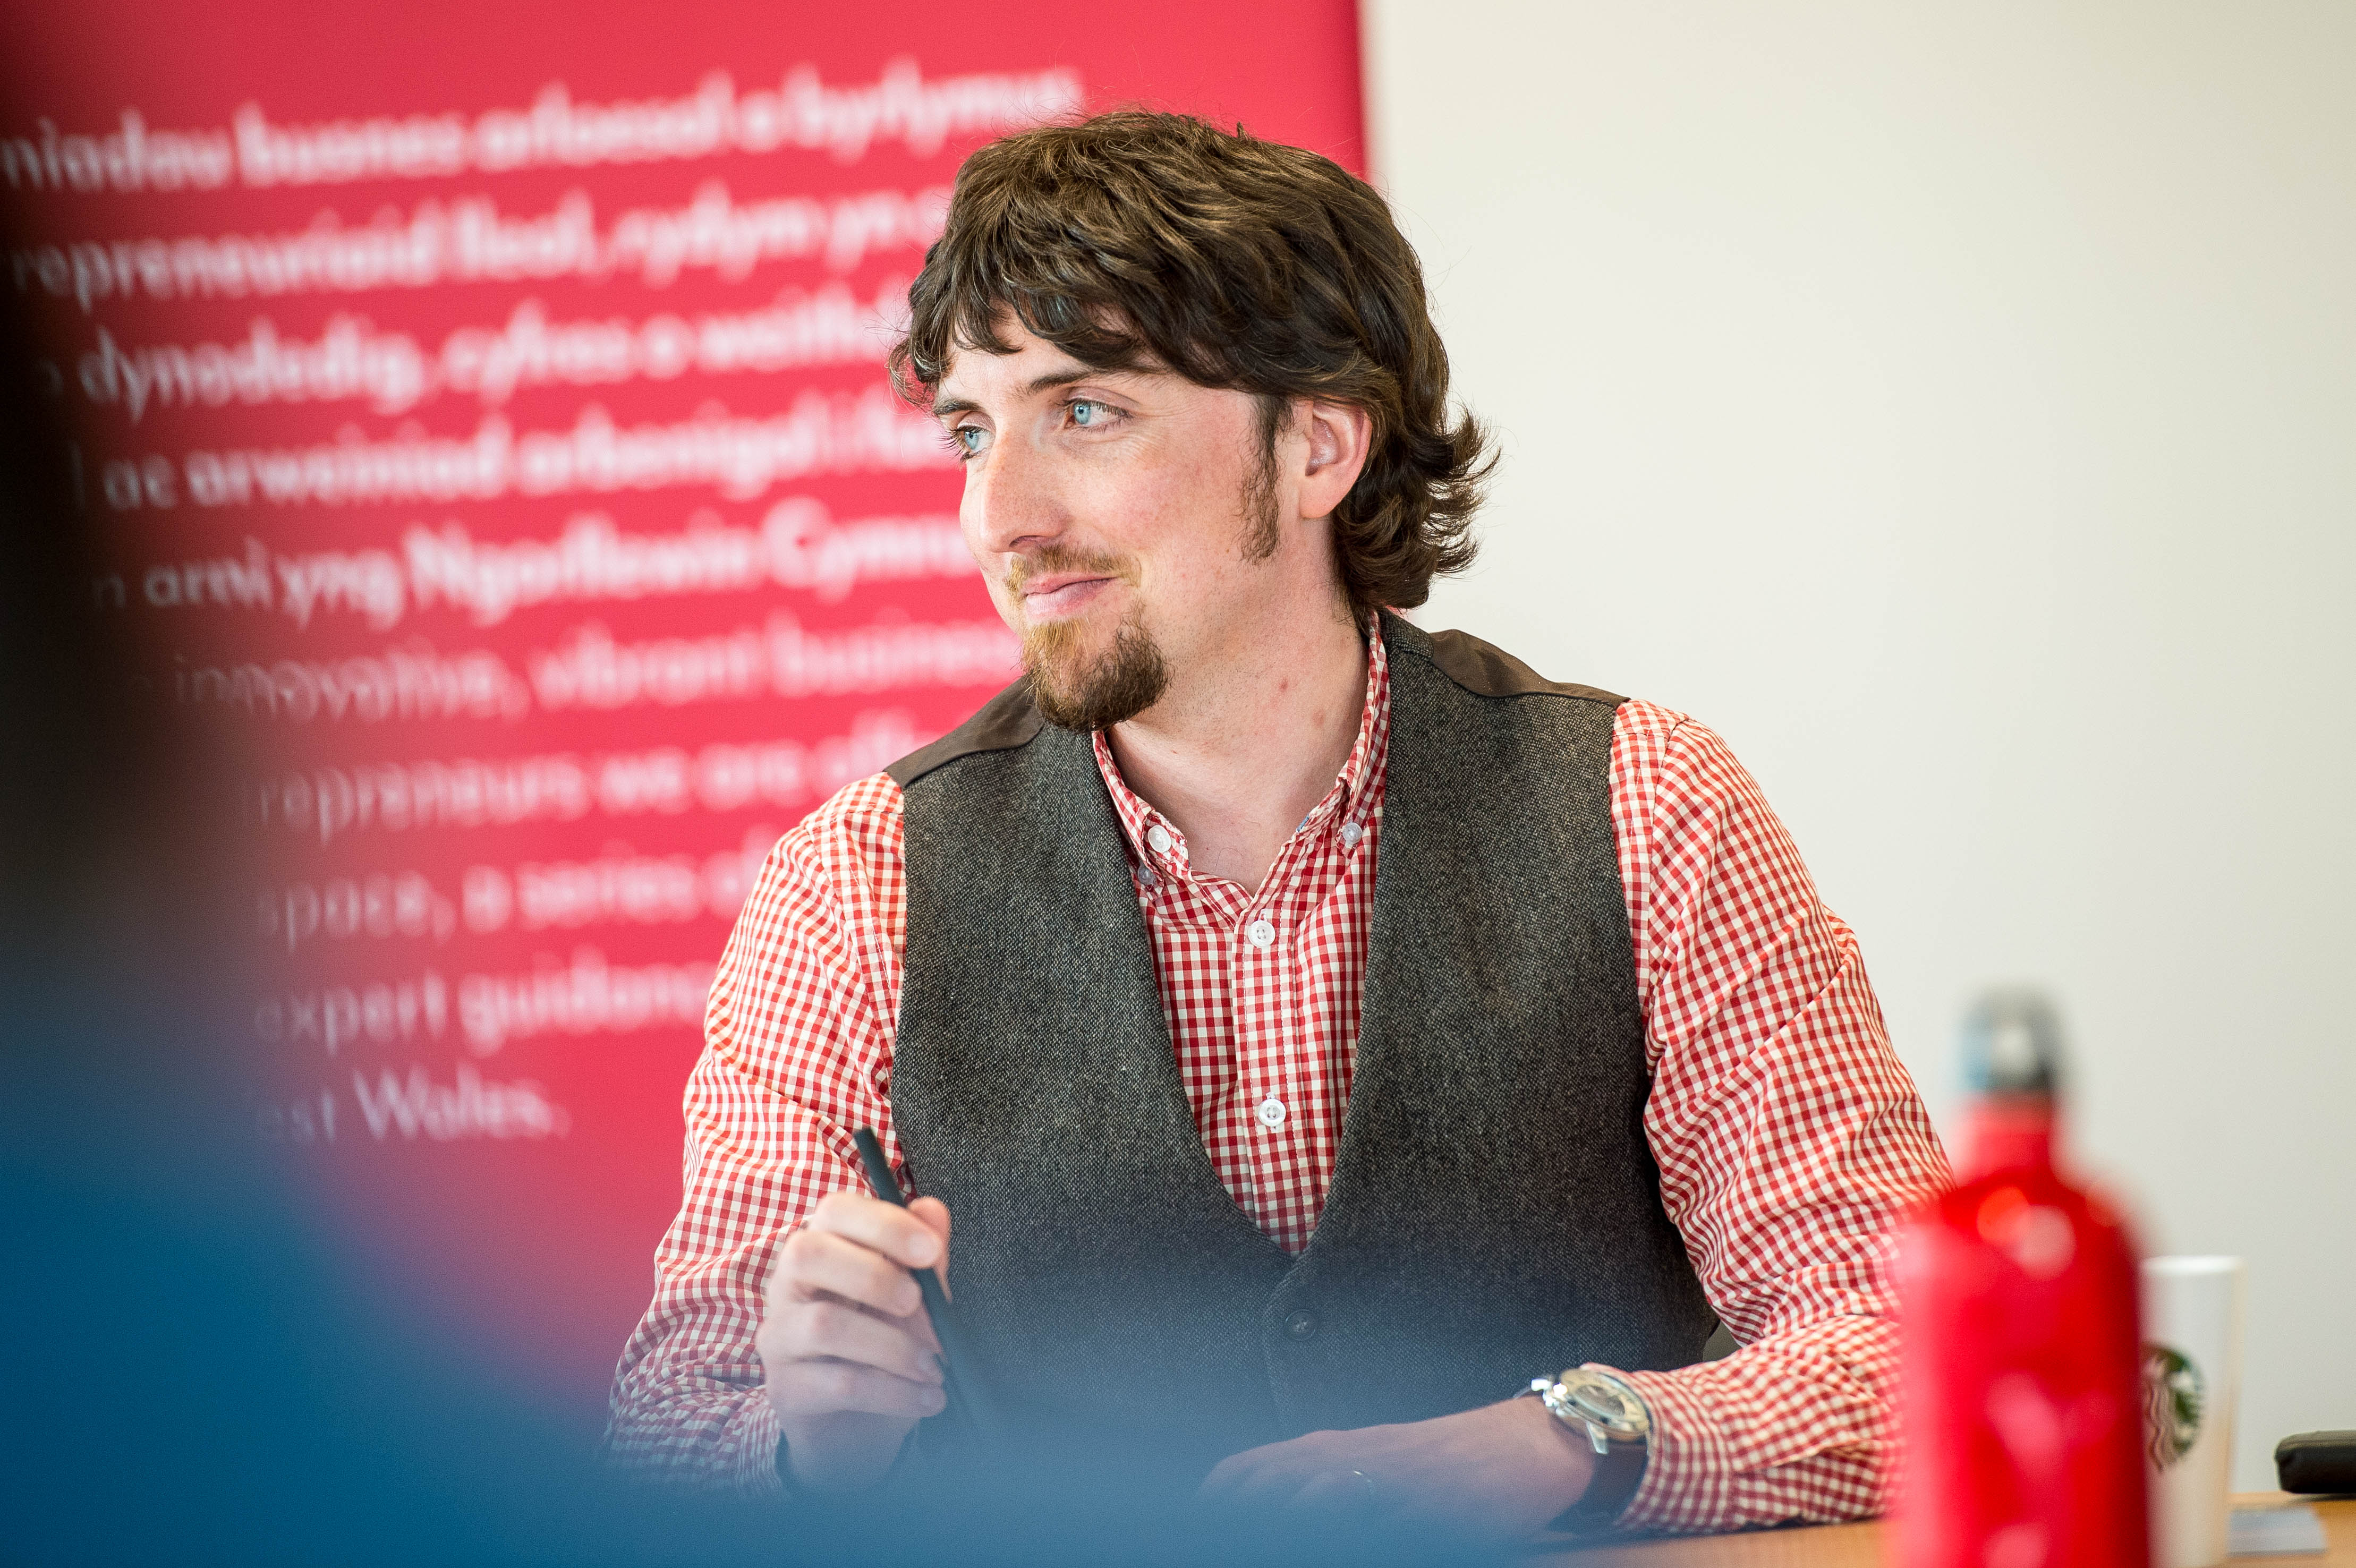 Daniel Patterson, Highly speaking in a branding workshop